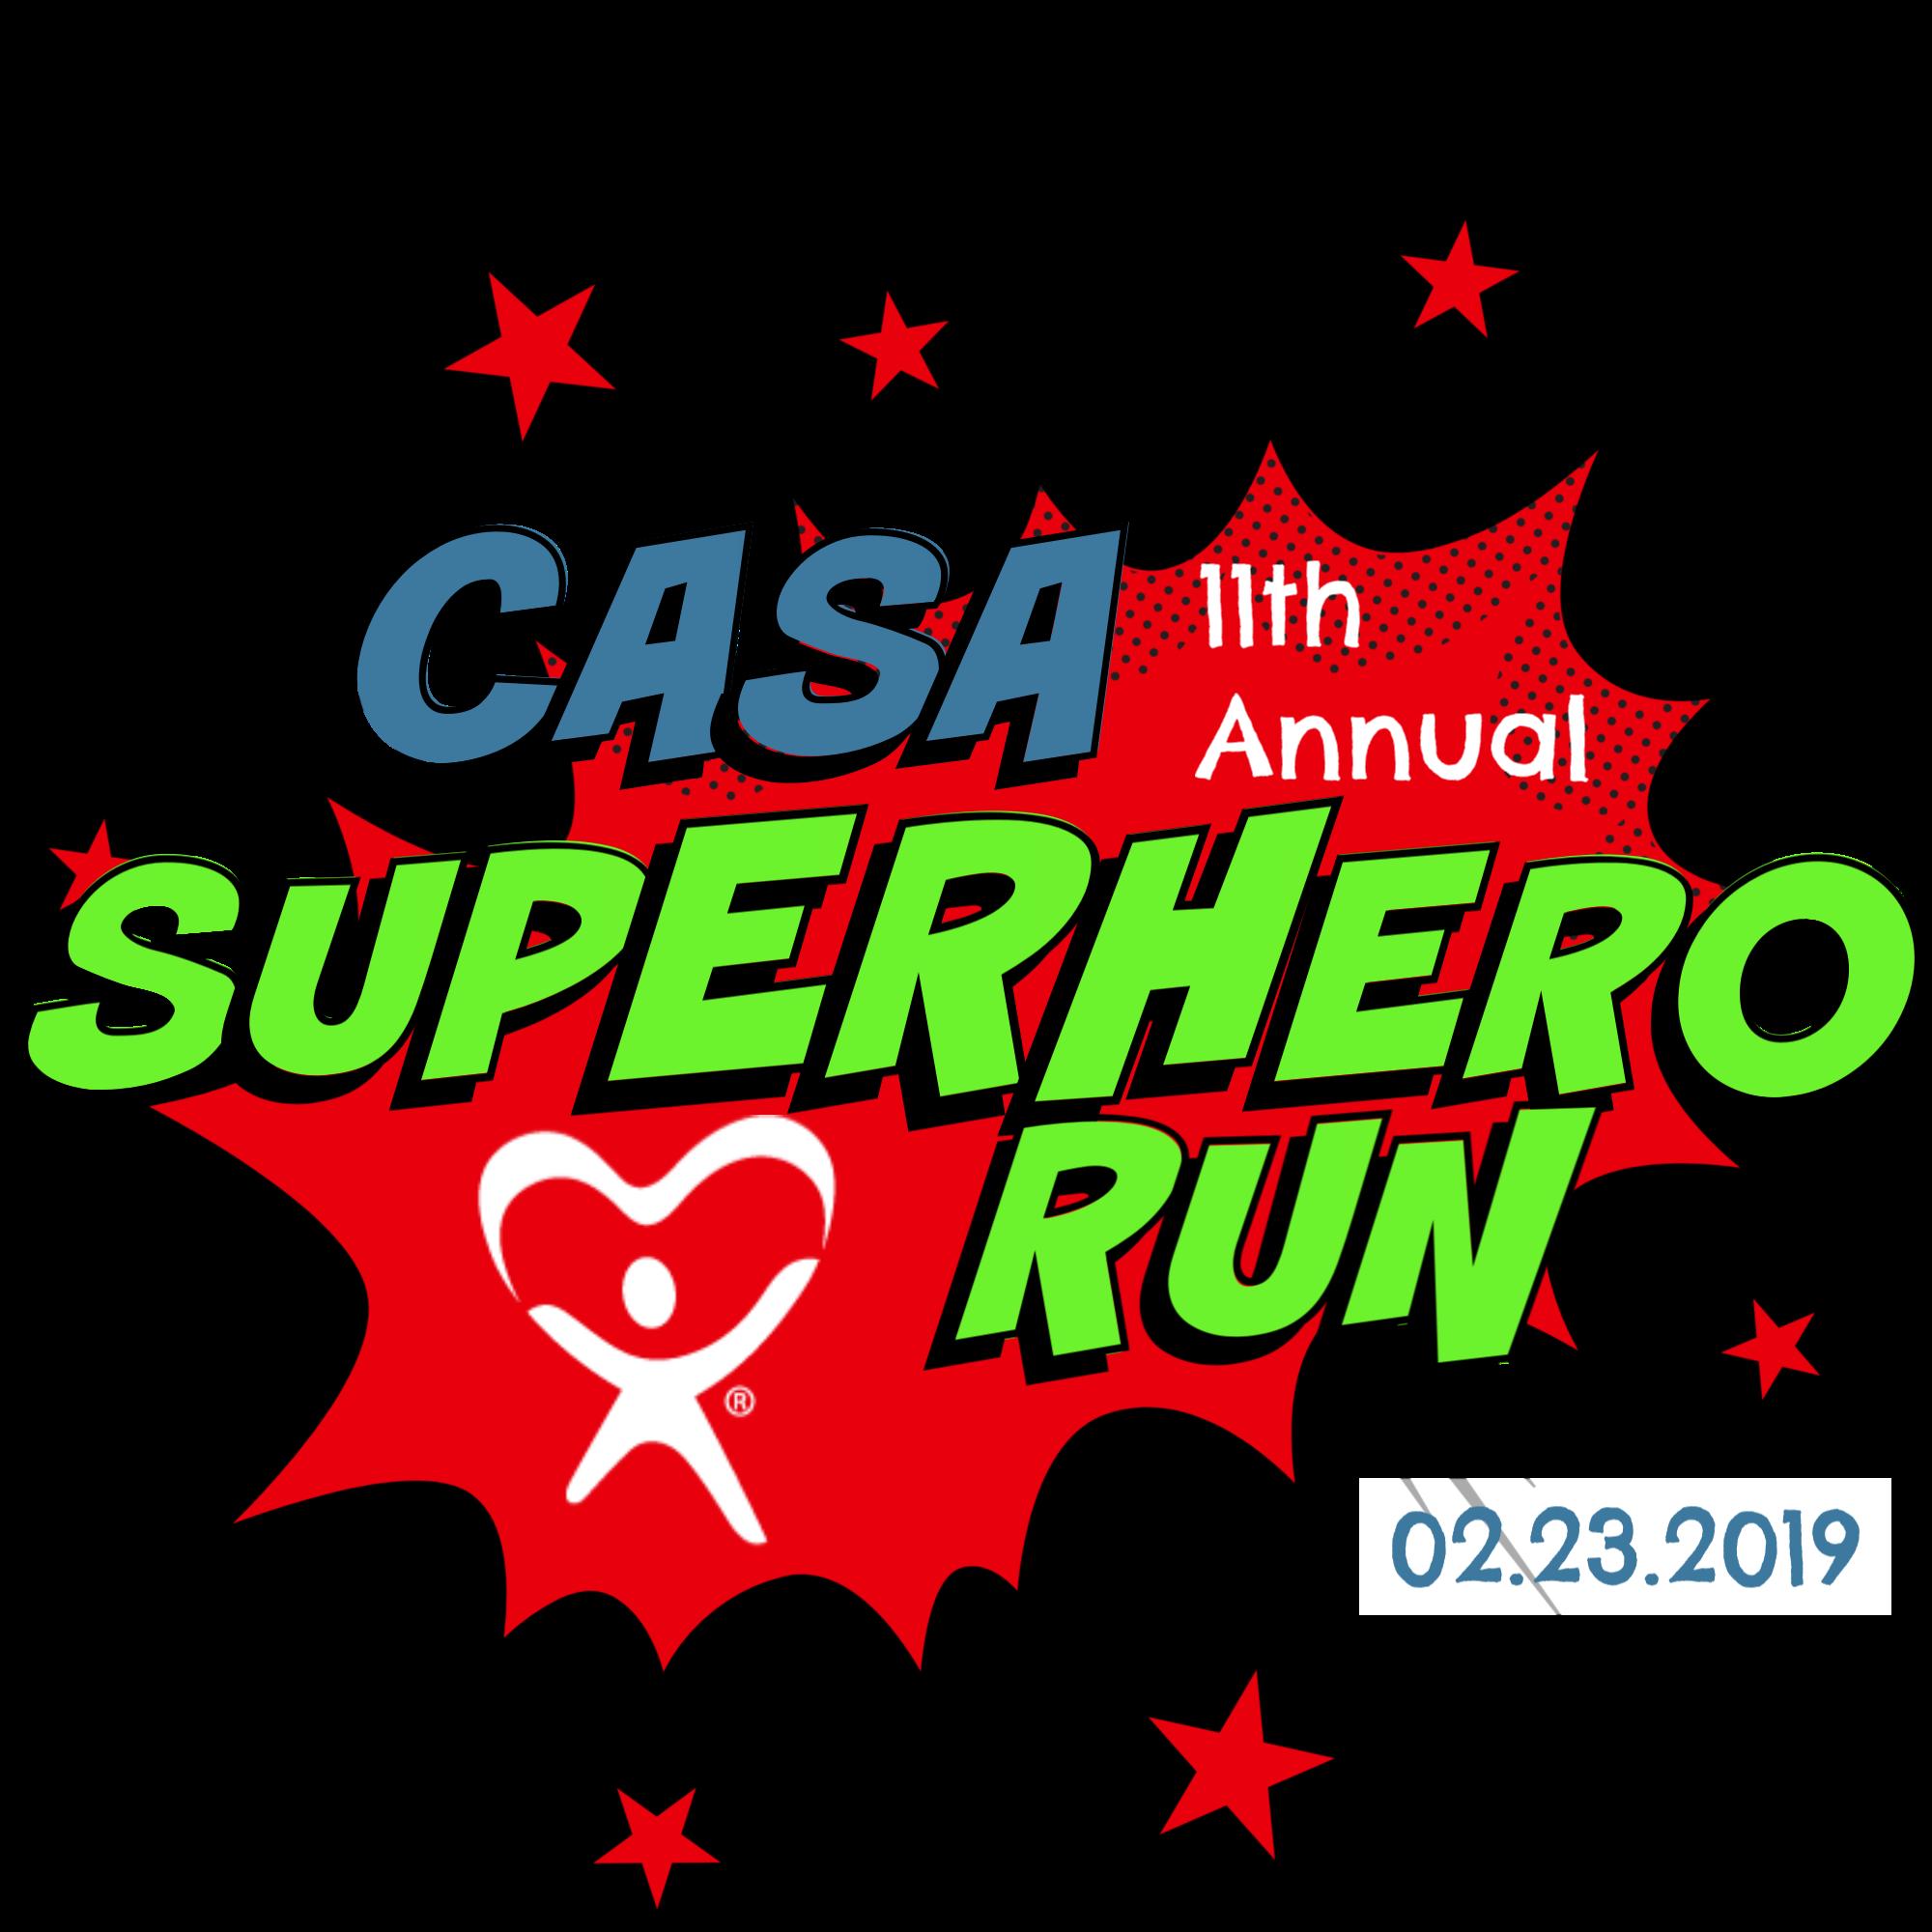 Be a SUPERHERO for CASA foster kids!